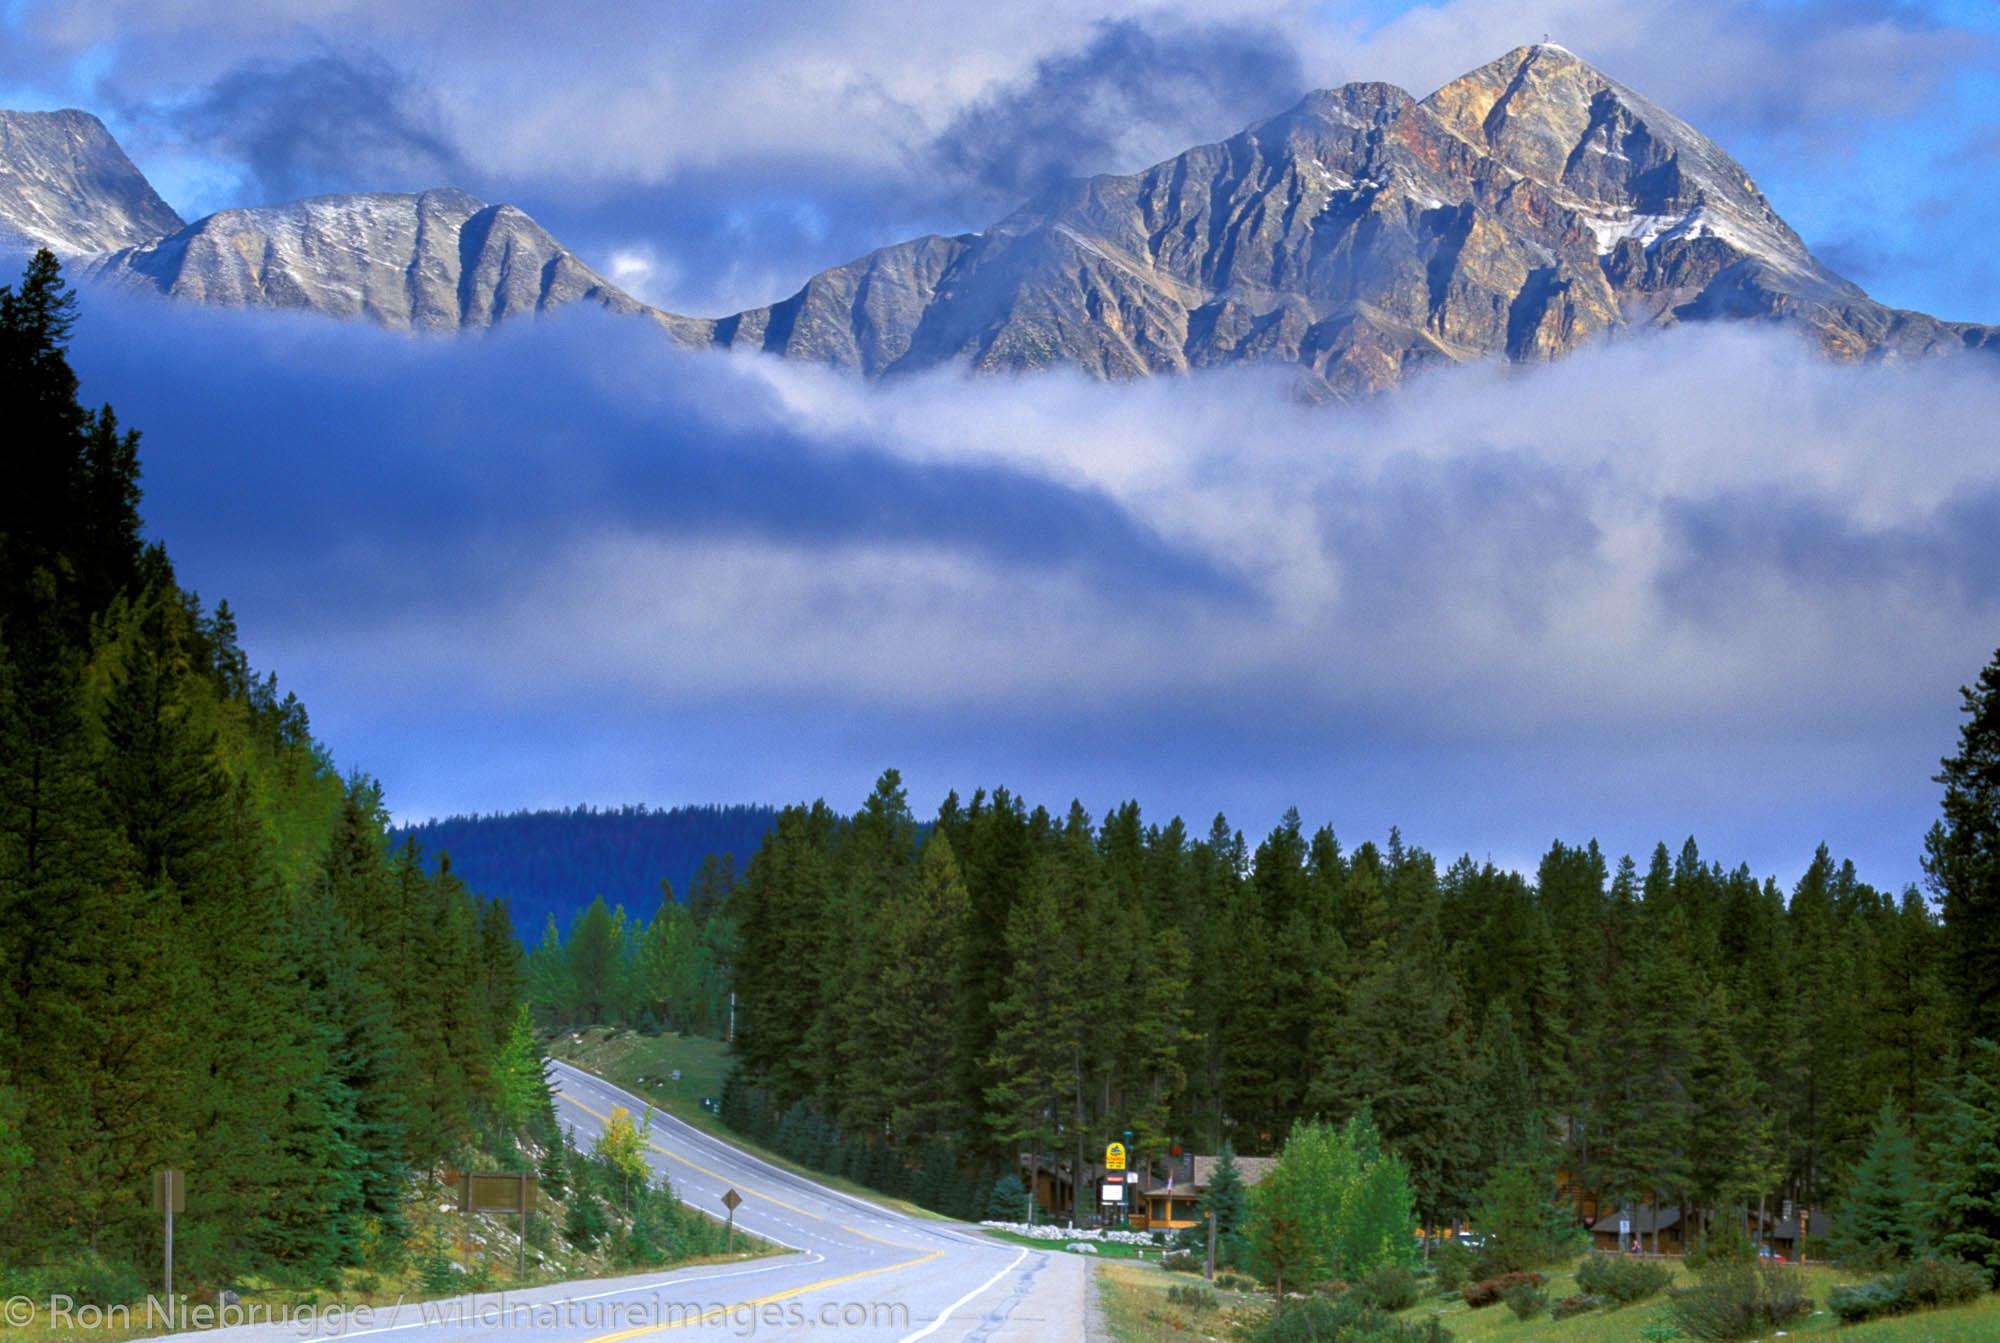 The Icefields Highway just outside of Jasper, Jasper National Park, Alberta, Canada.